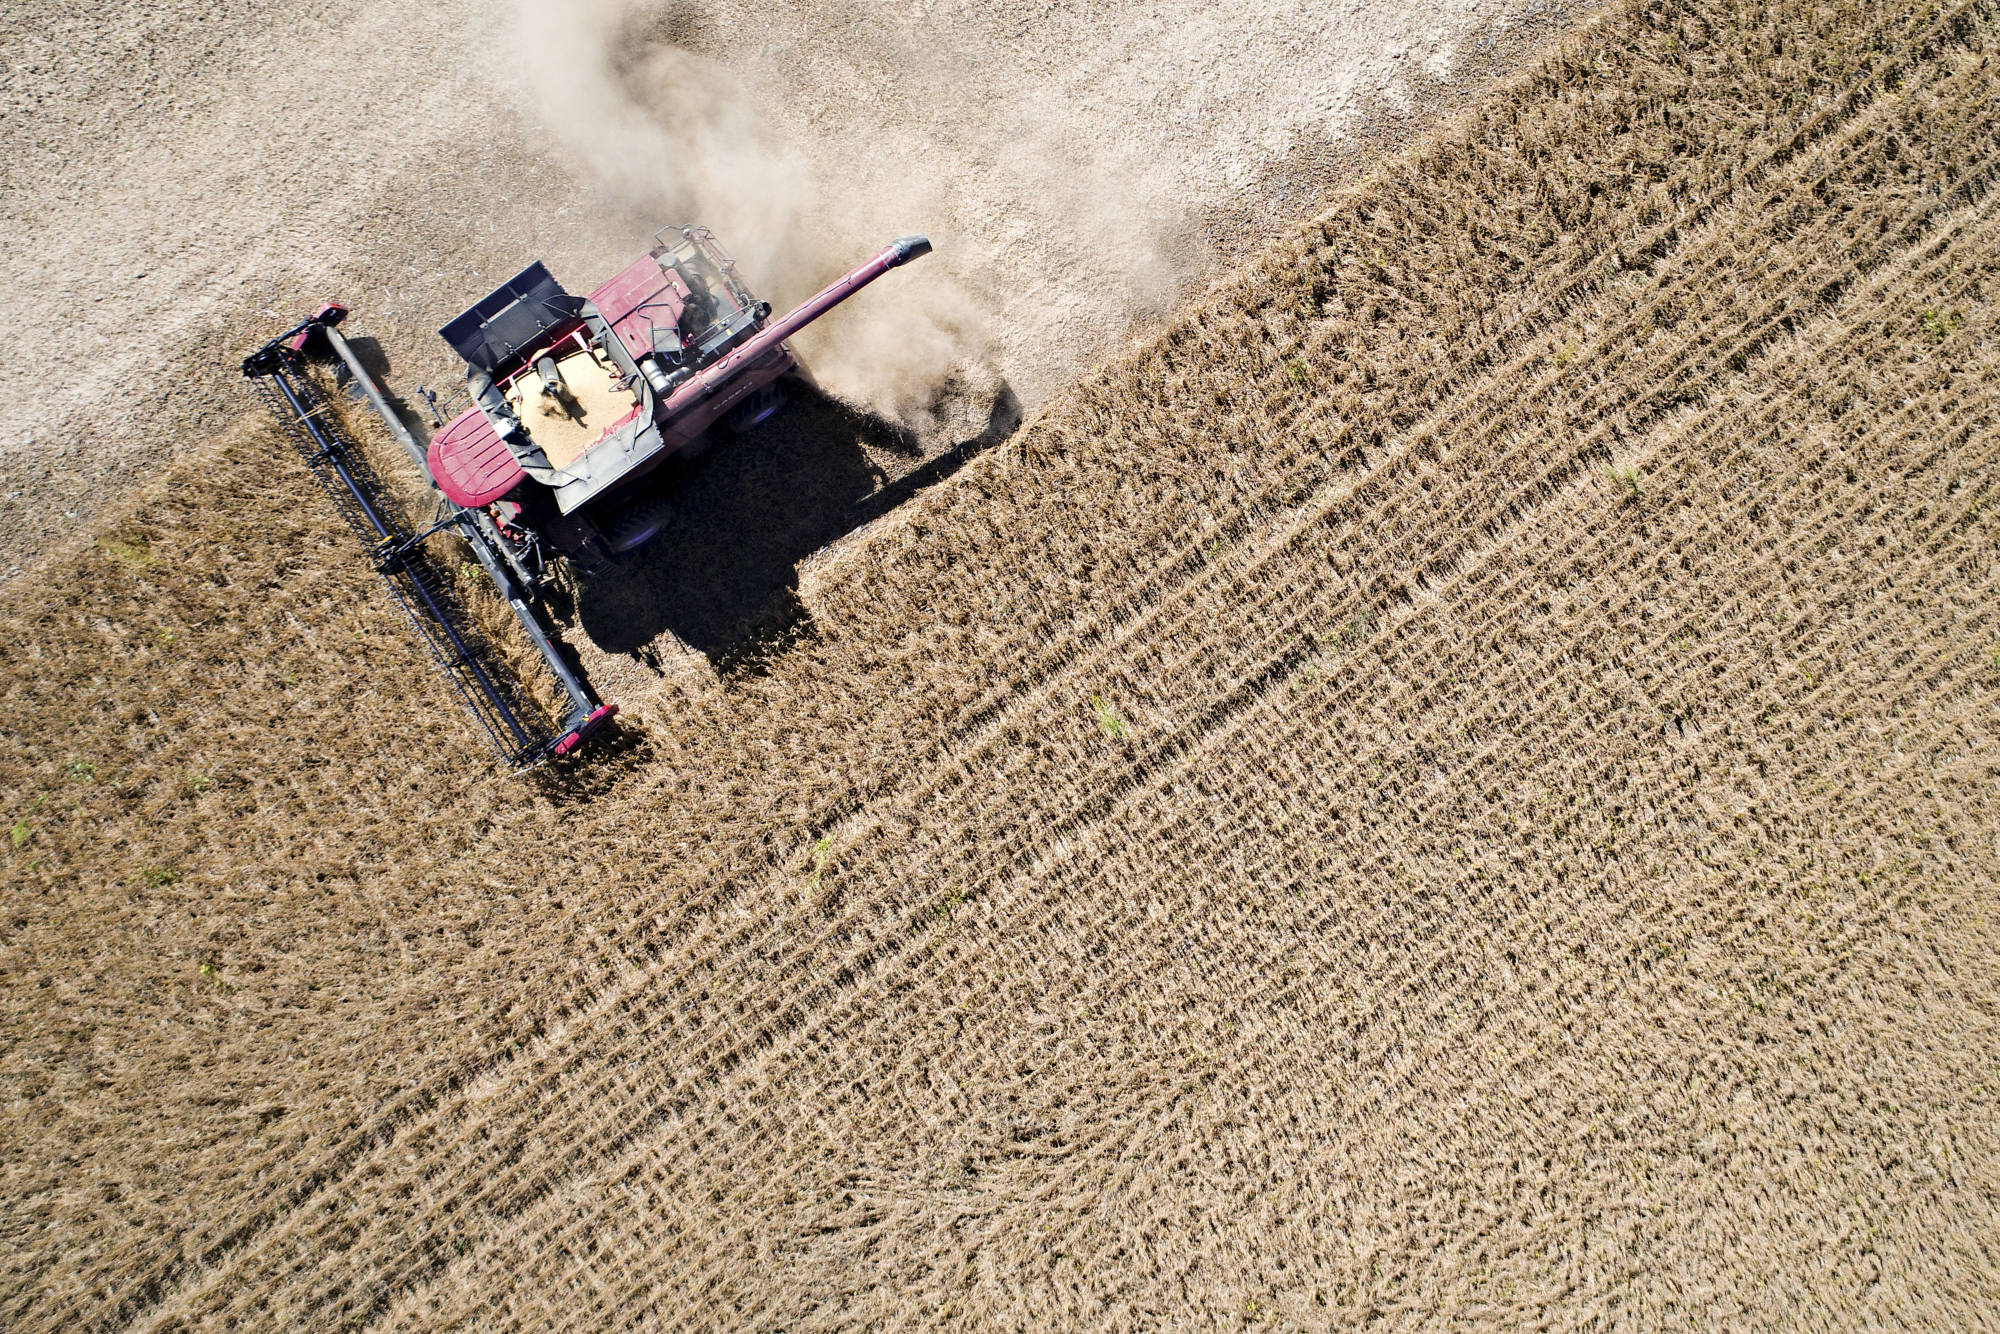 bloomberg.com - Jeff Kearns - U.S. Farm-Export Prices Drop Most Since 2011